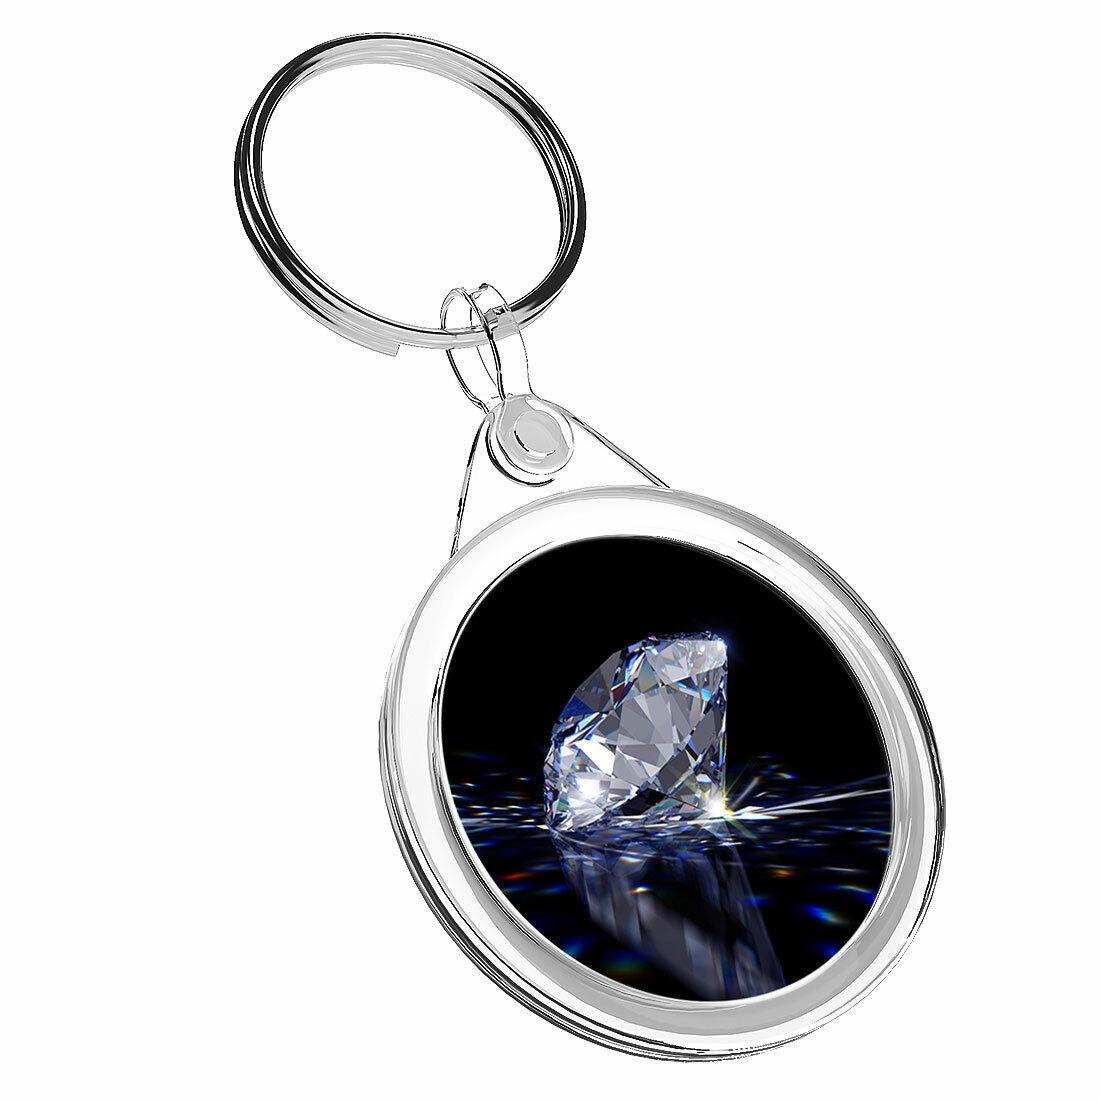 1 Diamond cristal piedra Bonita-x KEYRING IR02 mamá DAD Niños Regalo de Cumpleaños #2165